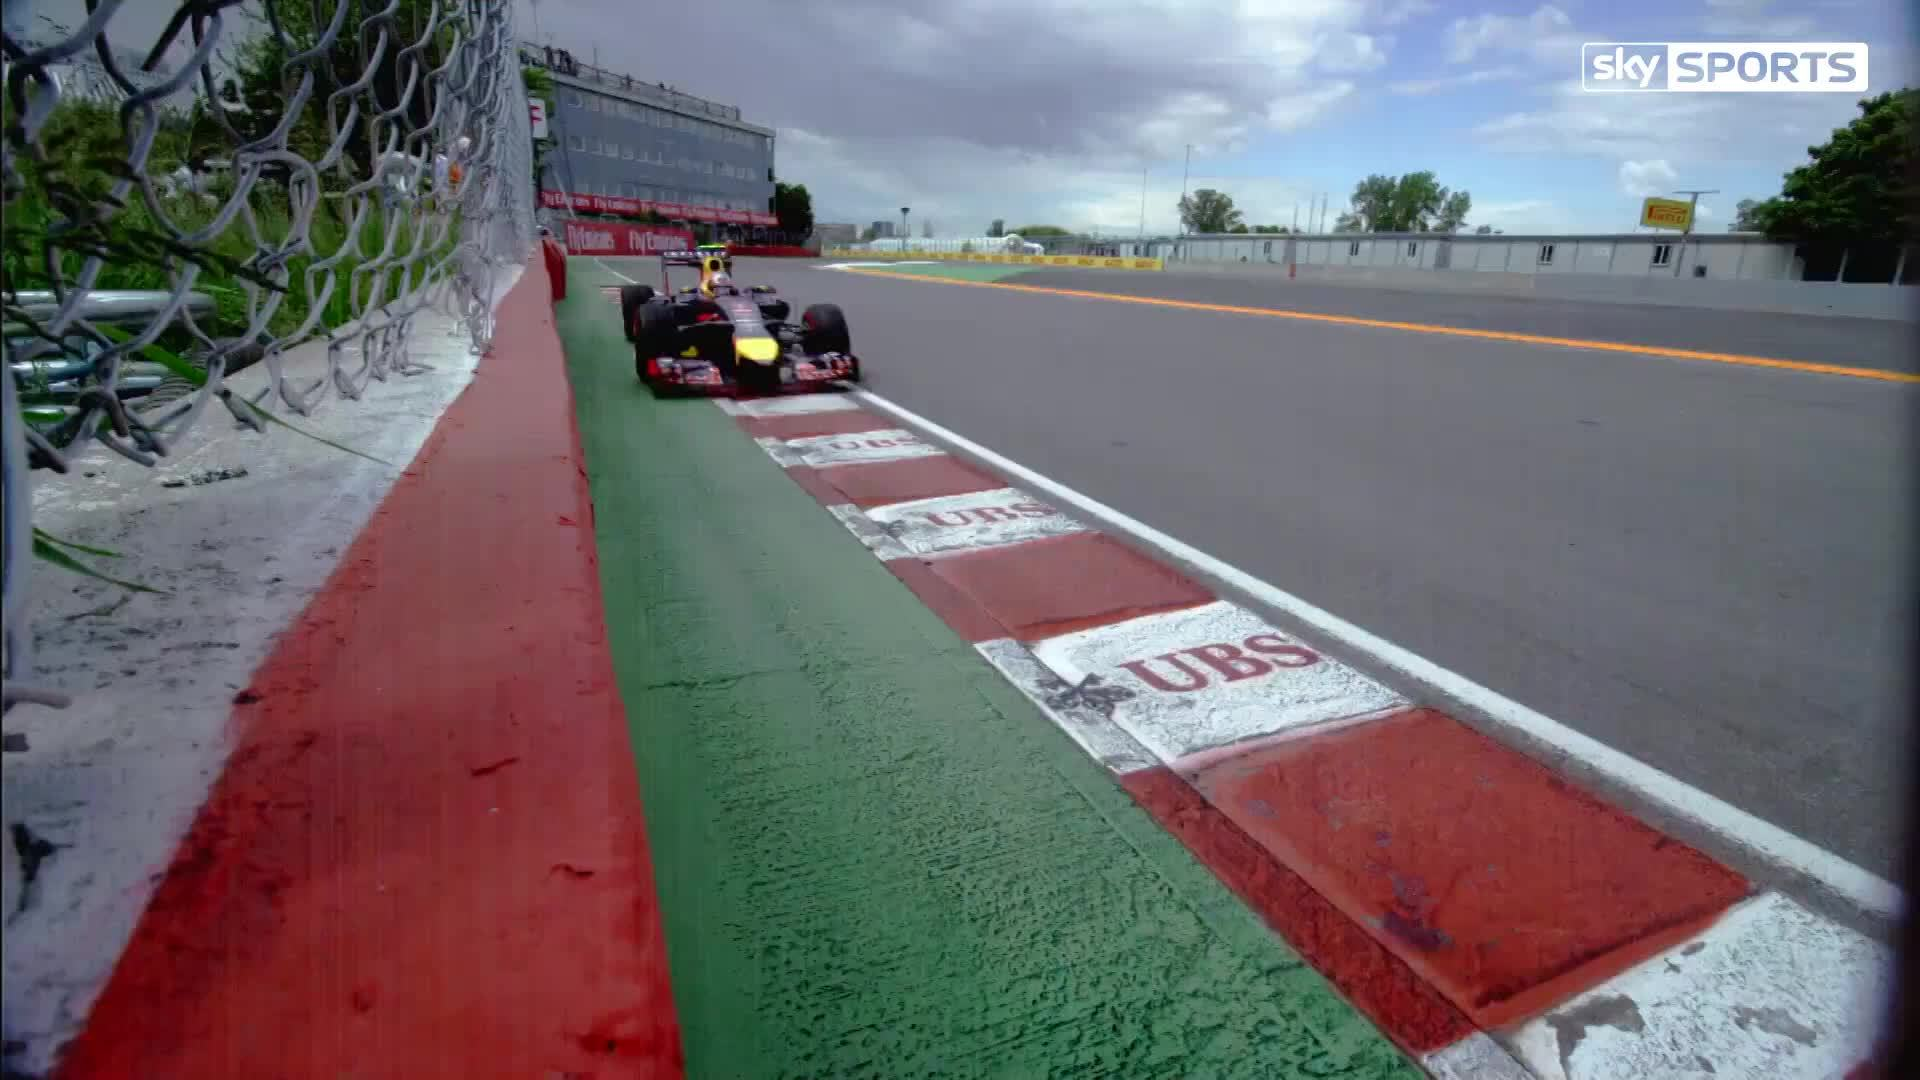 formula1, [GIF] Wall of Champions - The Sweet Spot (reddit) GIFs